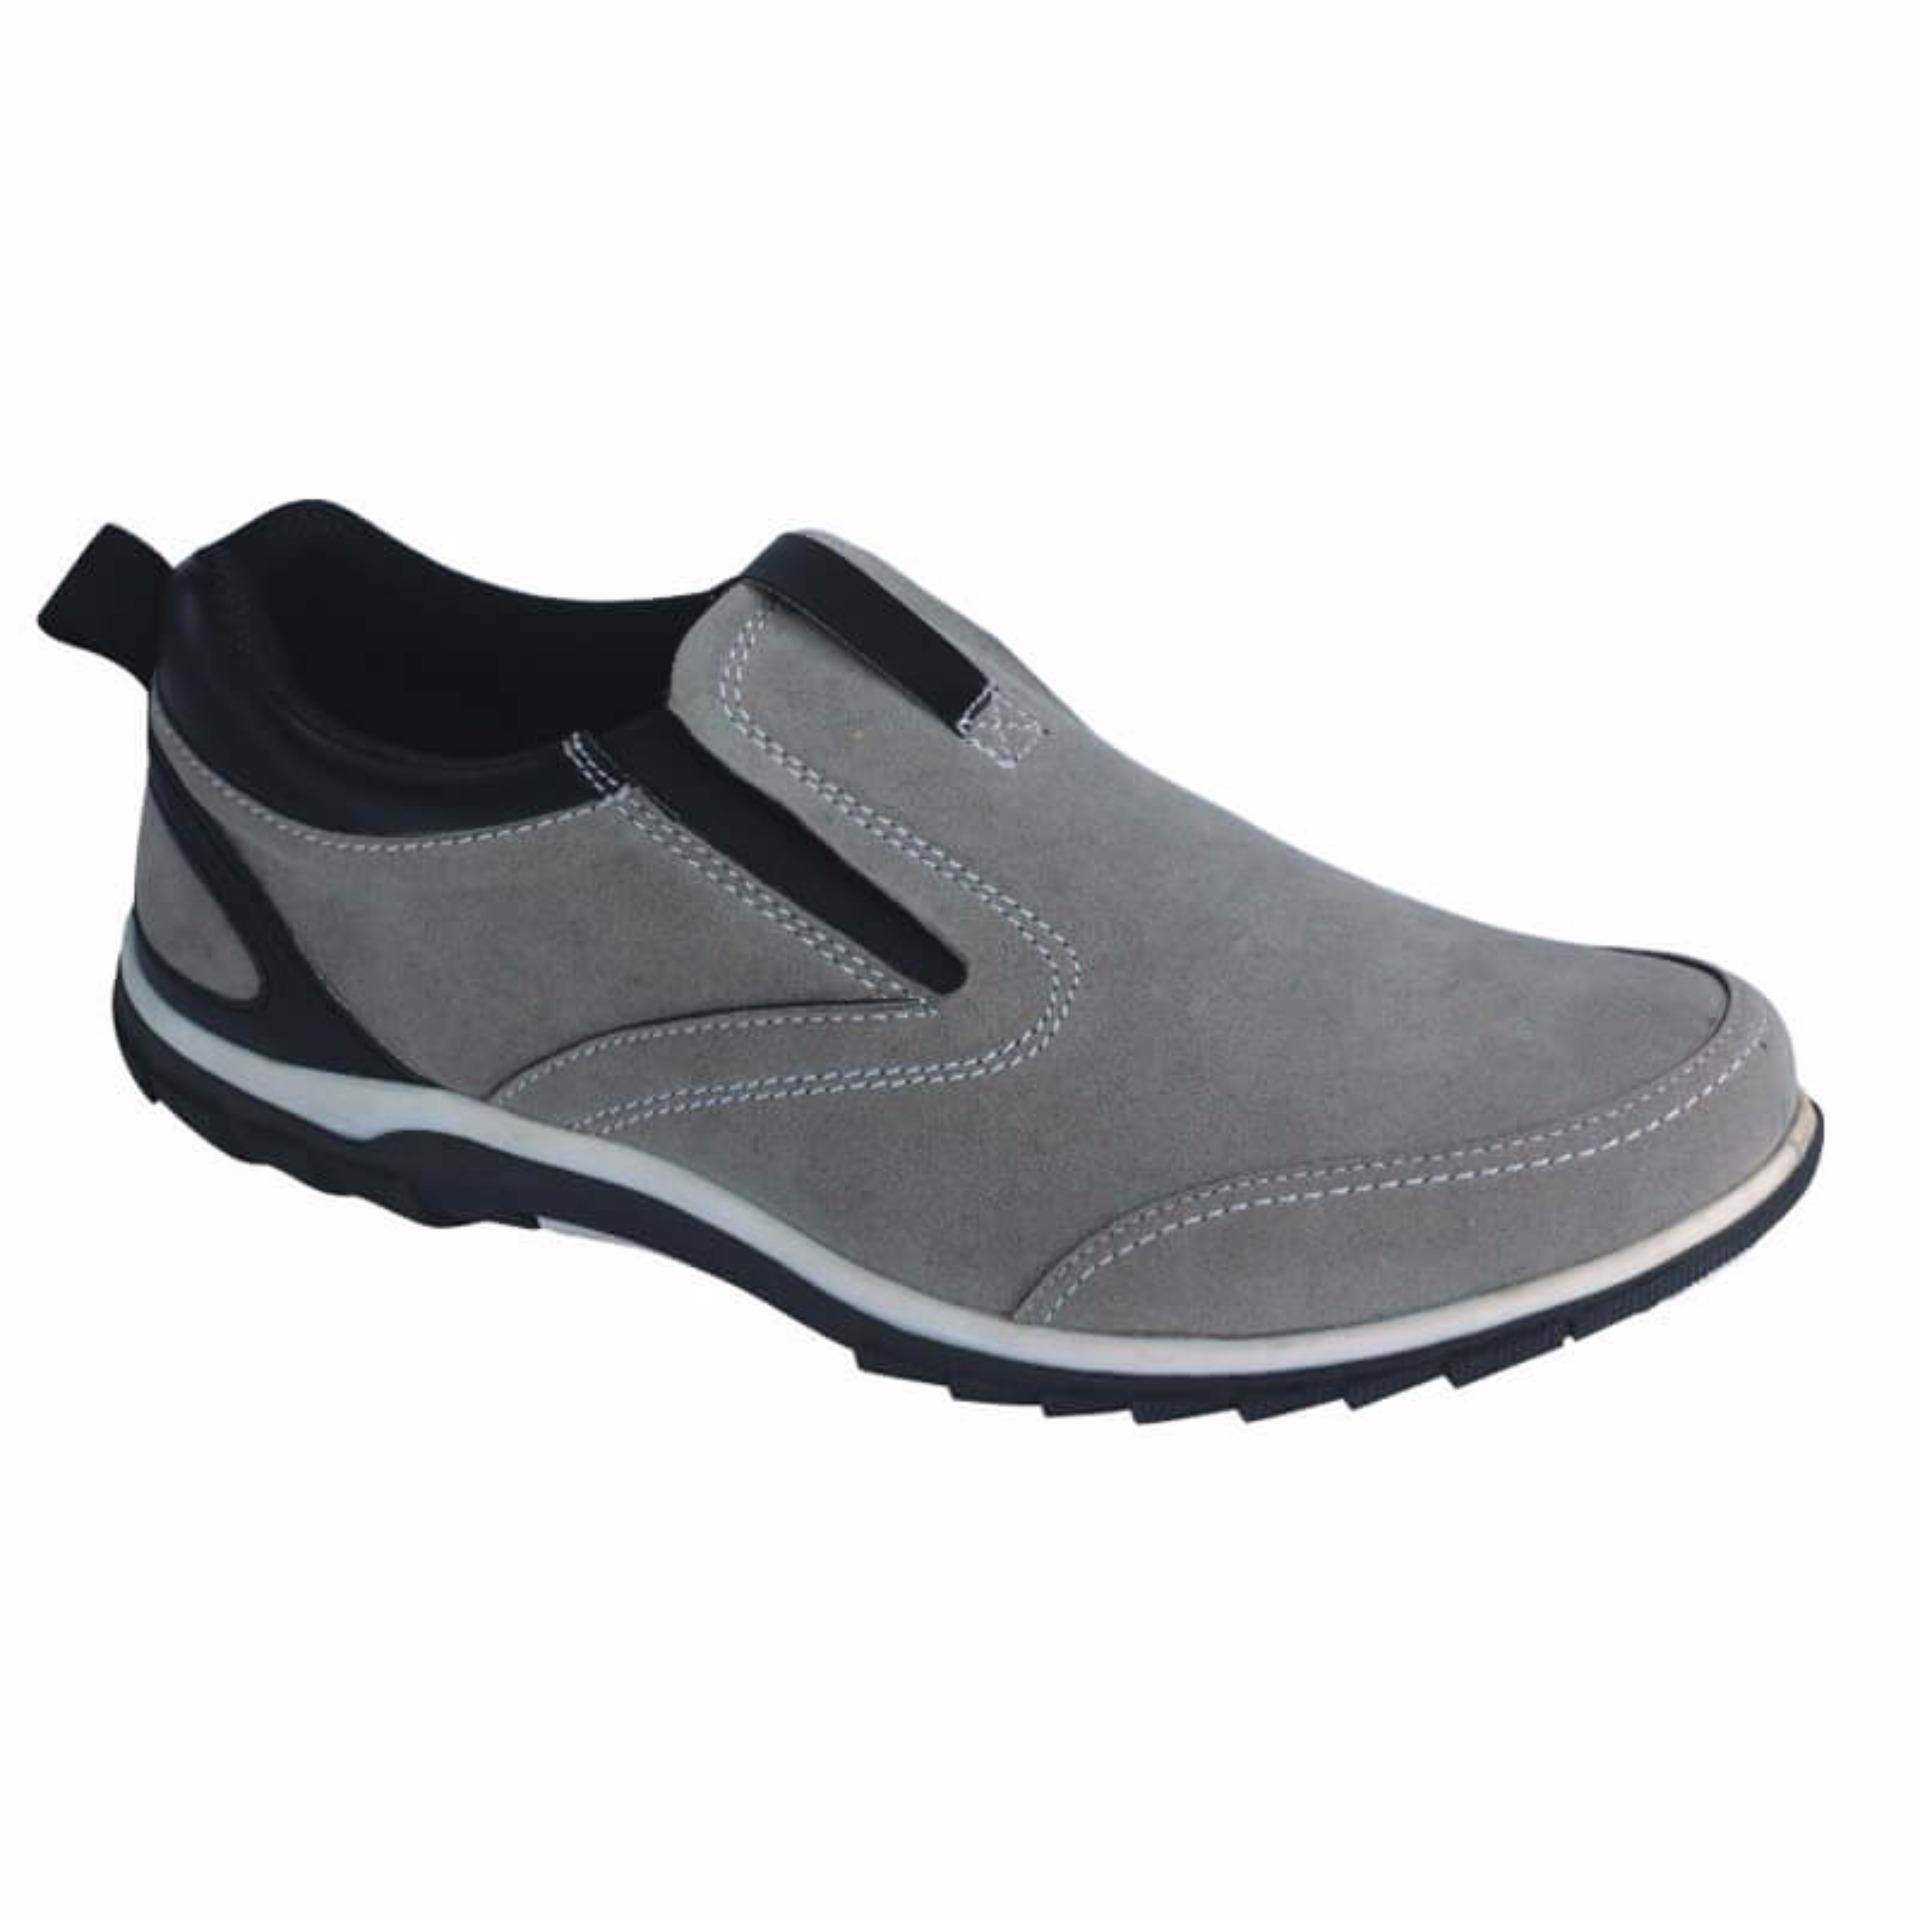 Miliki Segera Sepatu Slip On Sneakers Casual Pria Sd 008